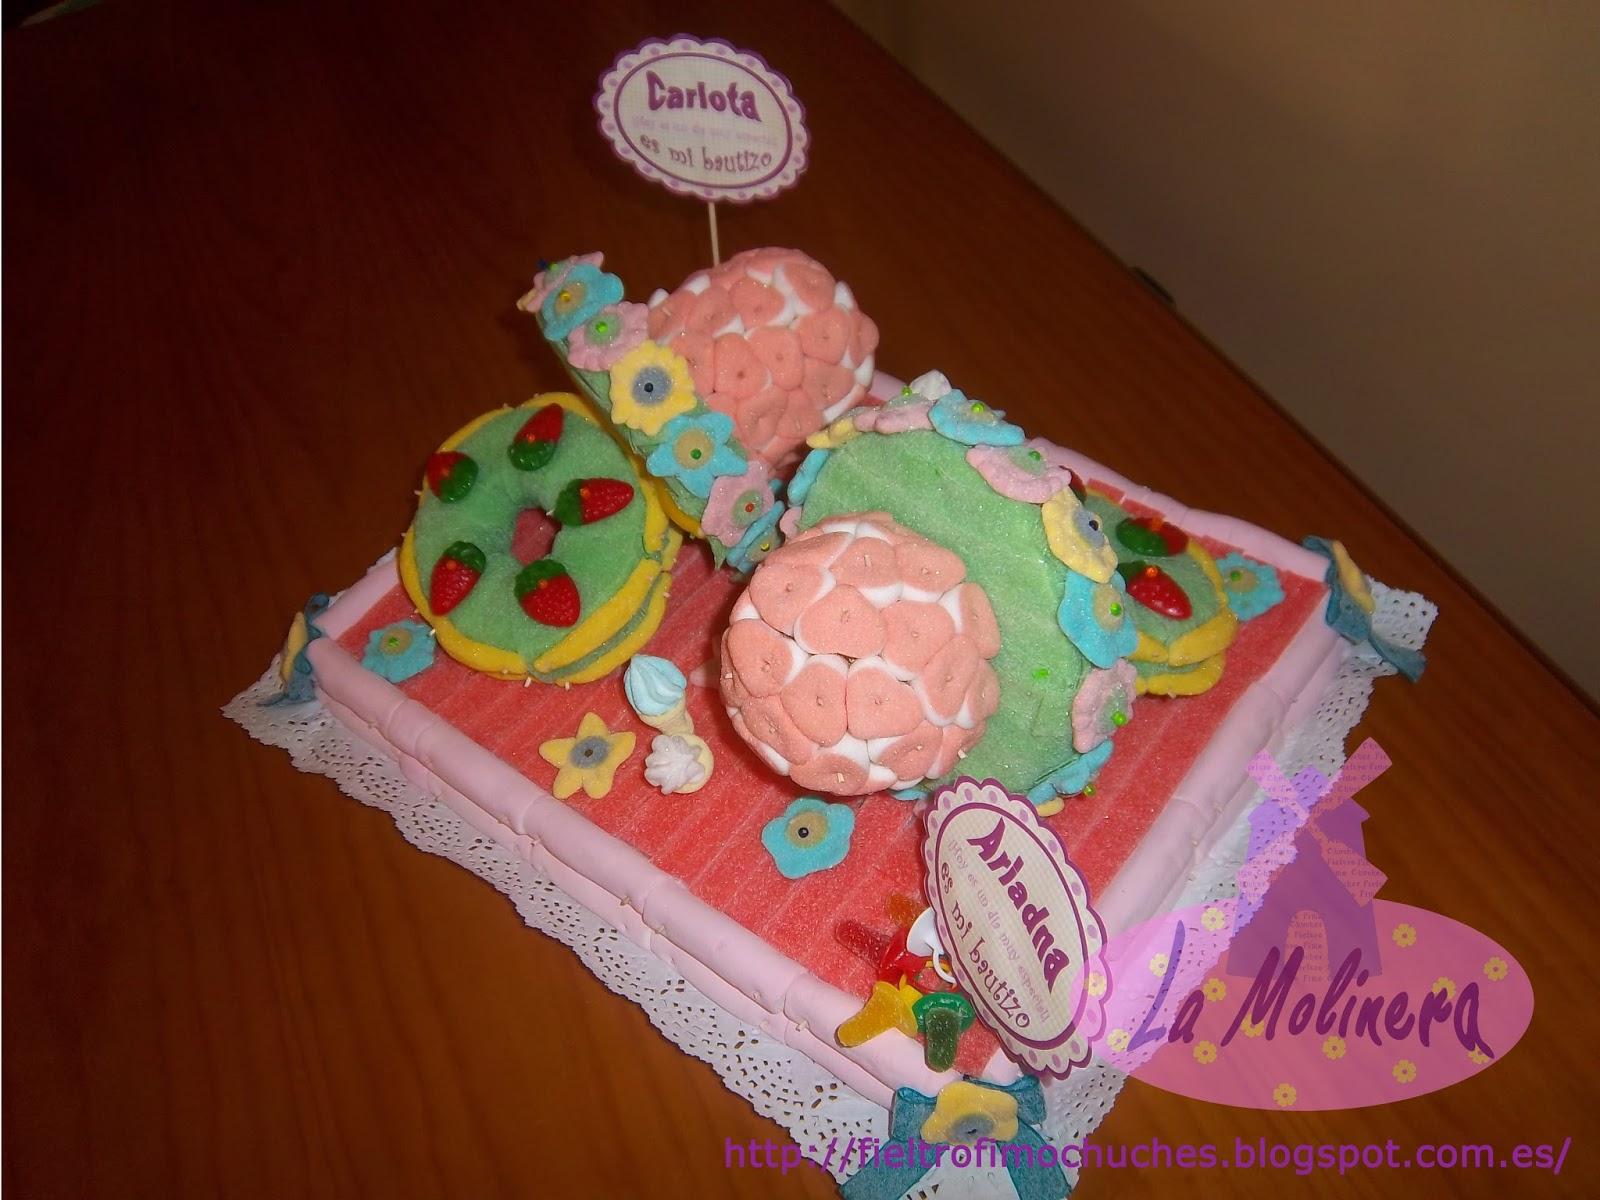 La molinera tarta bautizo chupetes - Chuches para bautizo ...